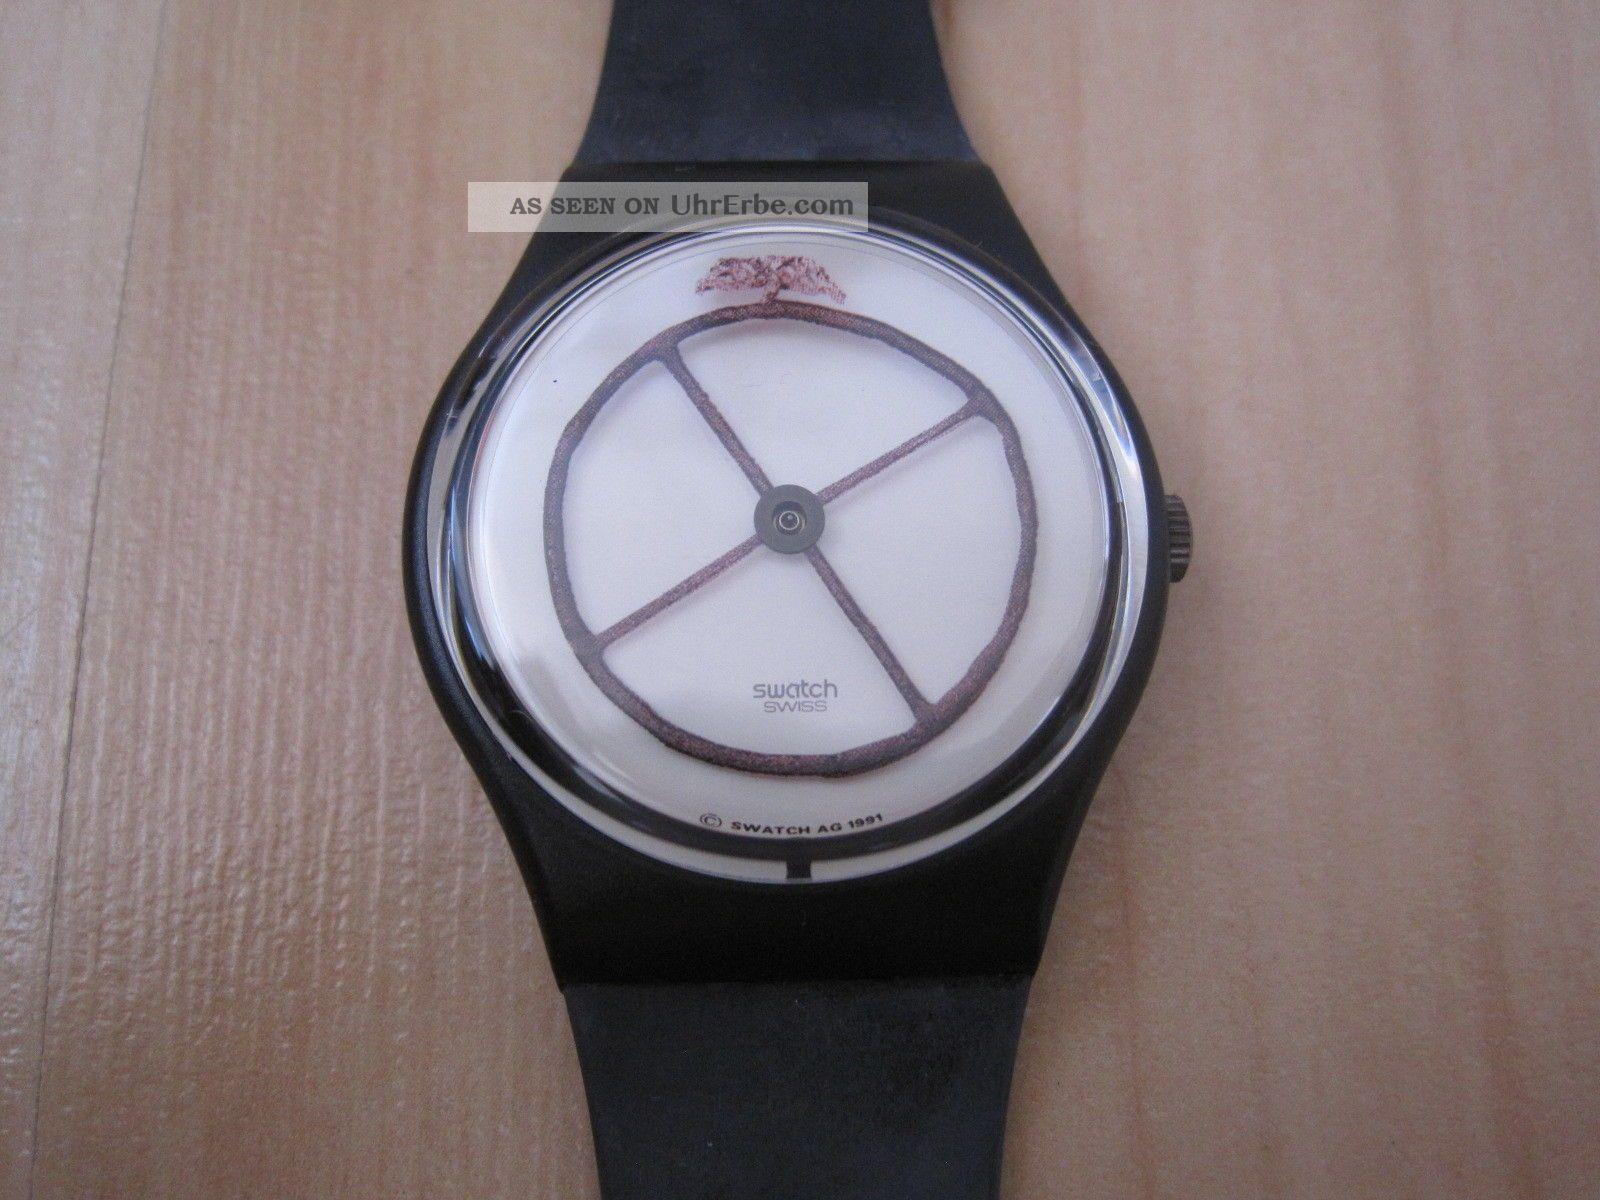 Swatch Not Vital Wheel Animal Gz120 Armbanduhr 700 Jahre Schweiz Mit Ovp Armbanduhren Bild